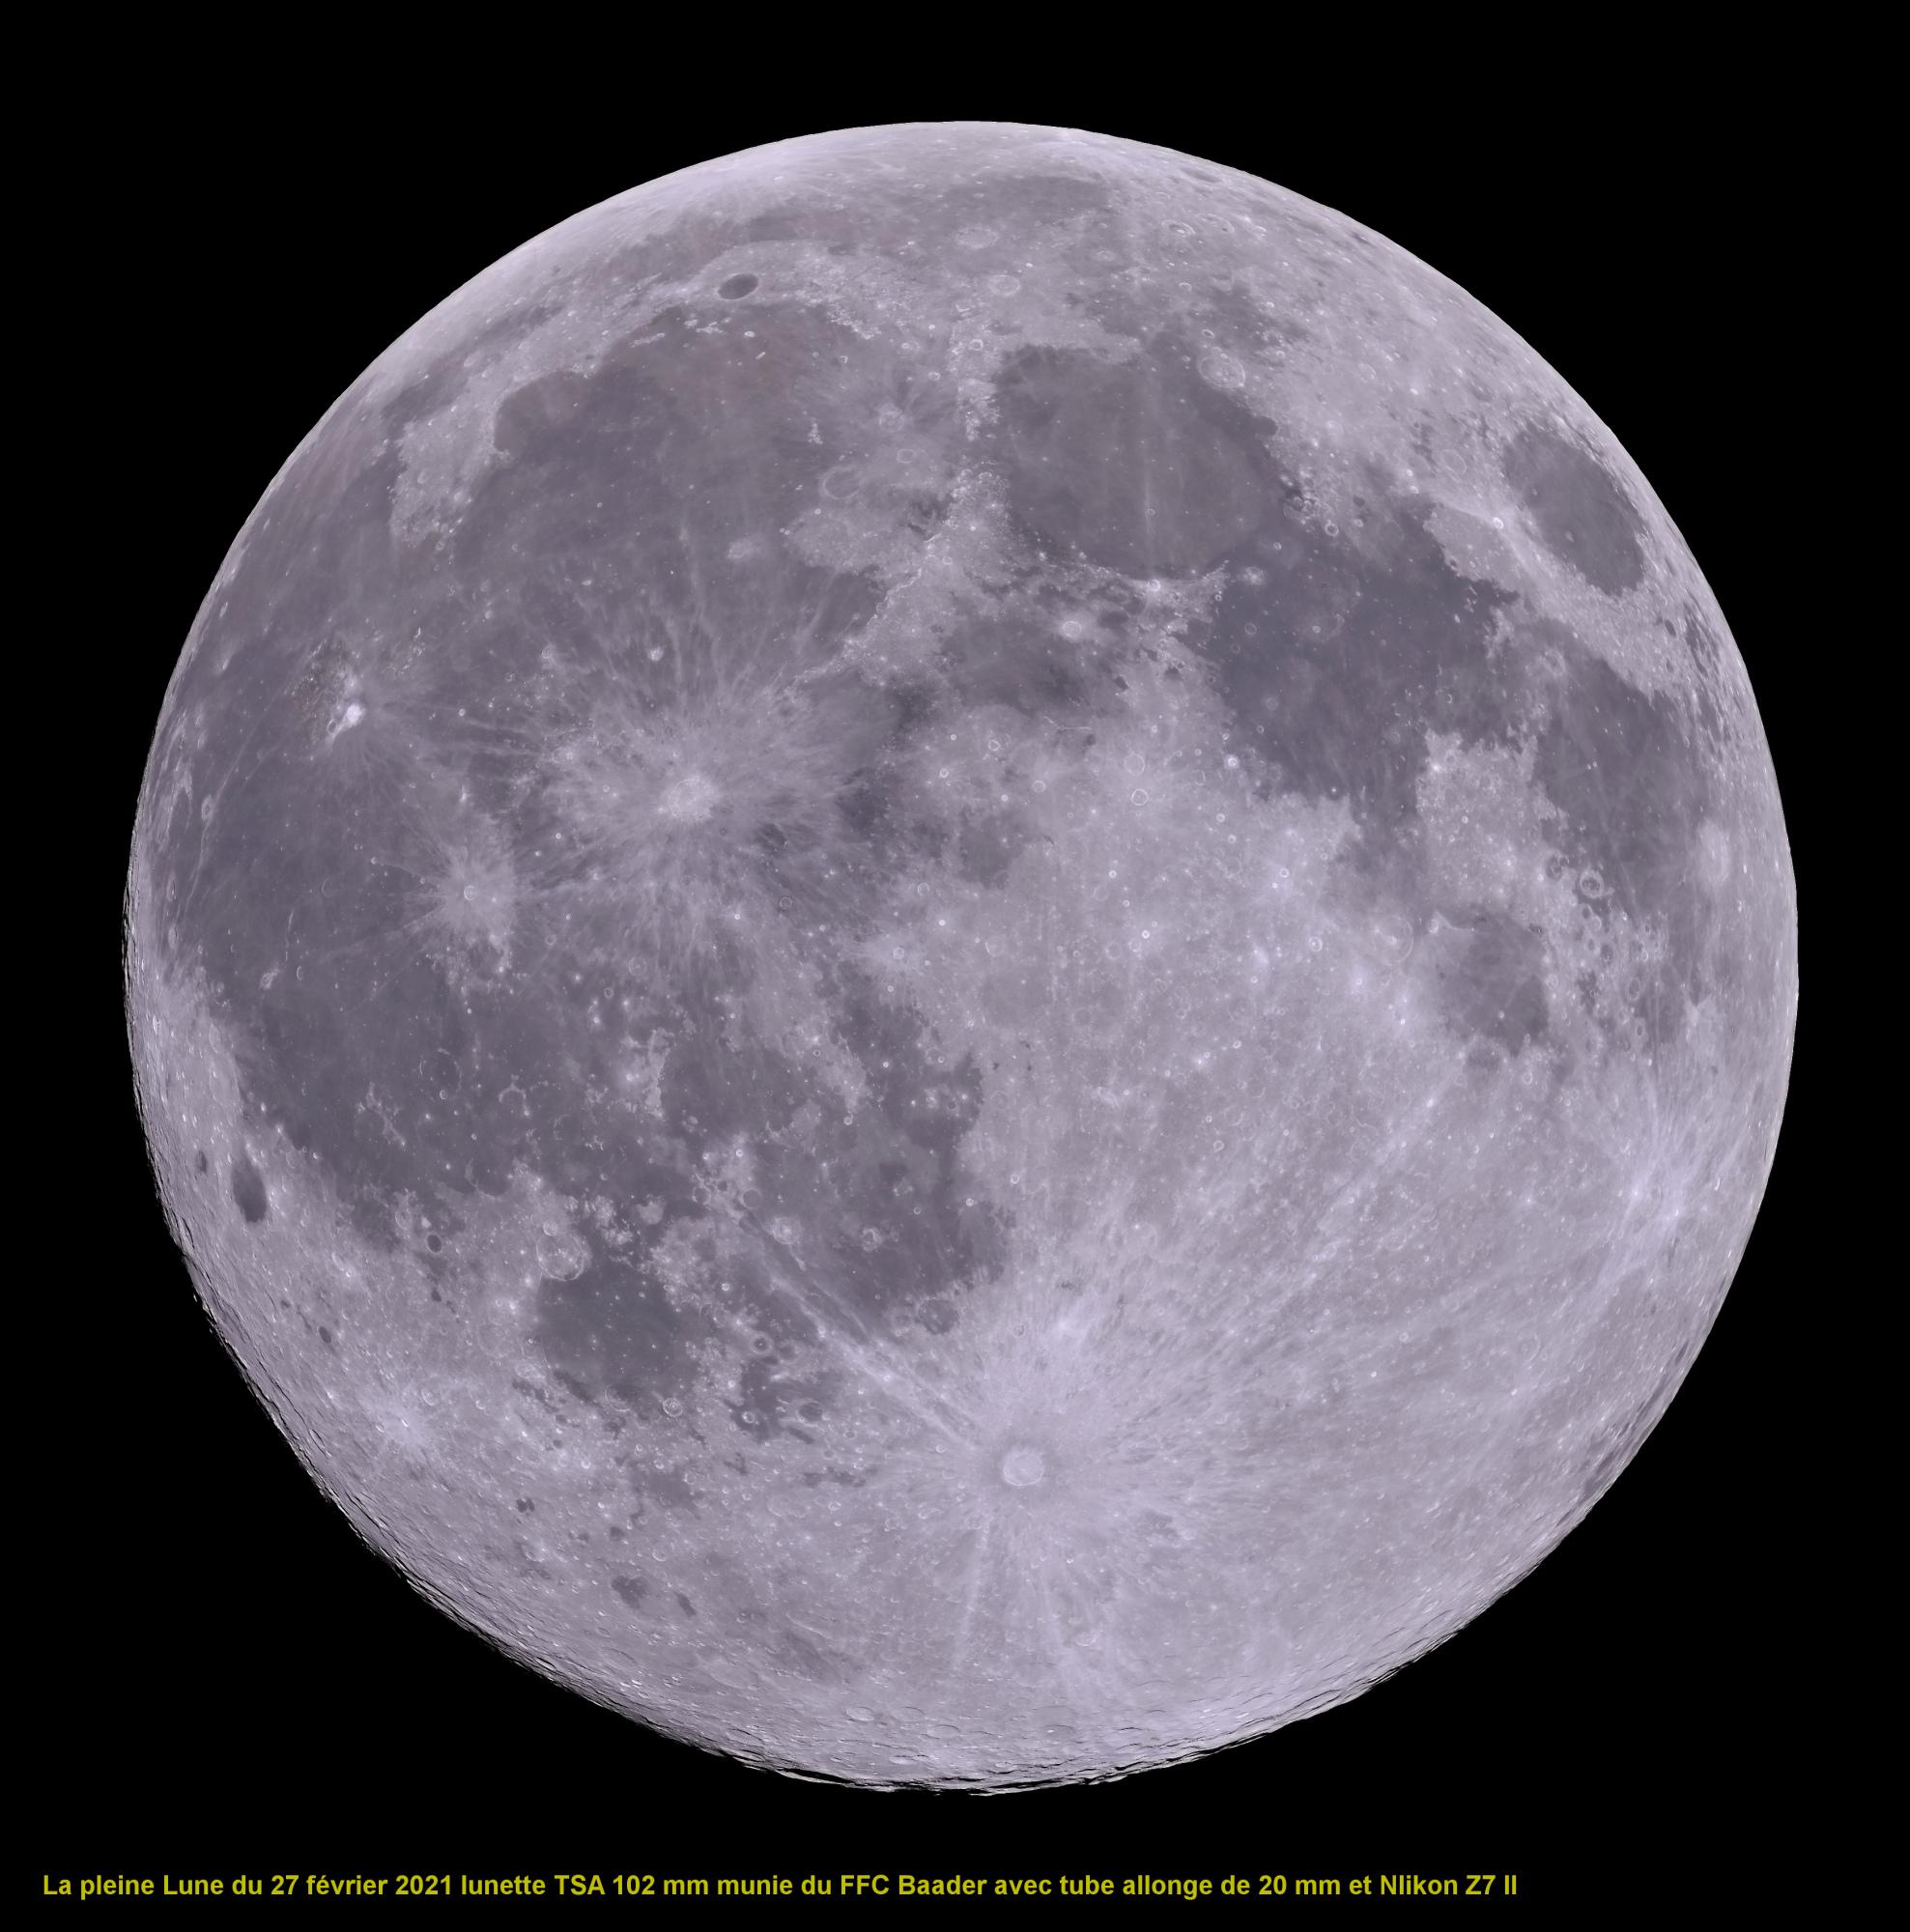 la Lune 37 images 65% Jpeg.jpg